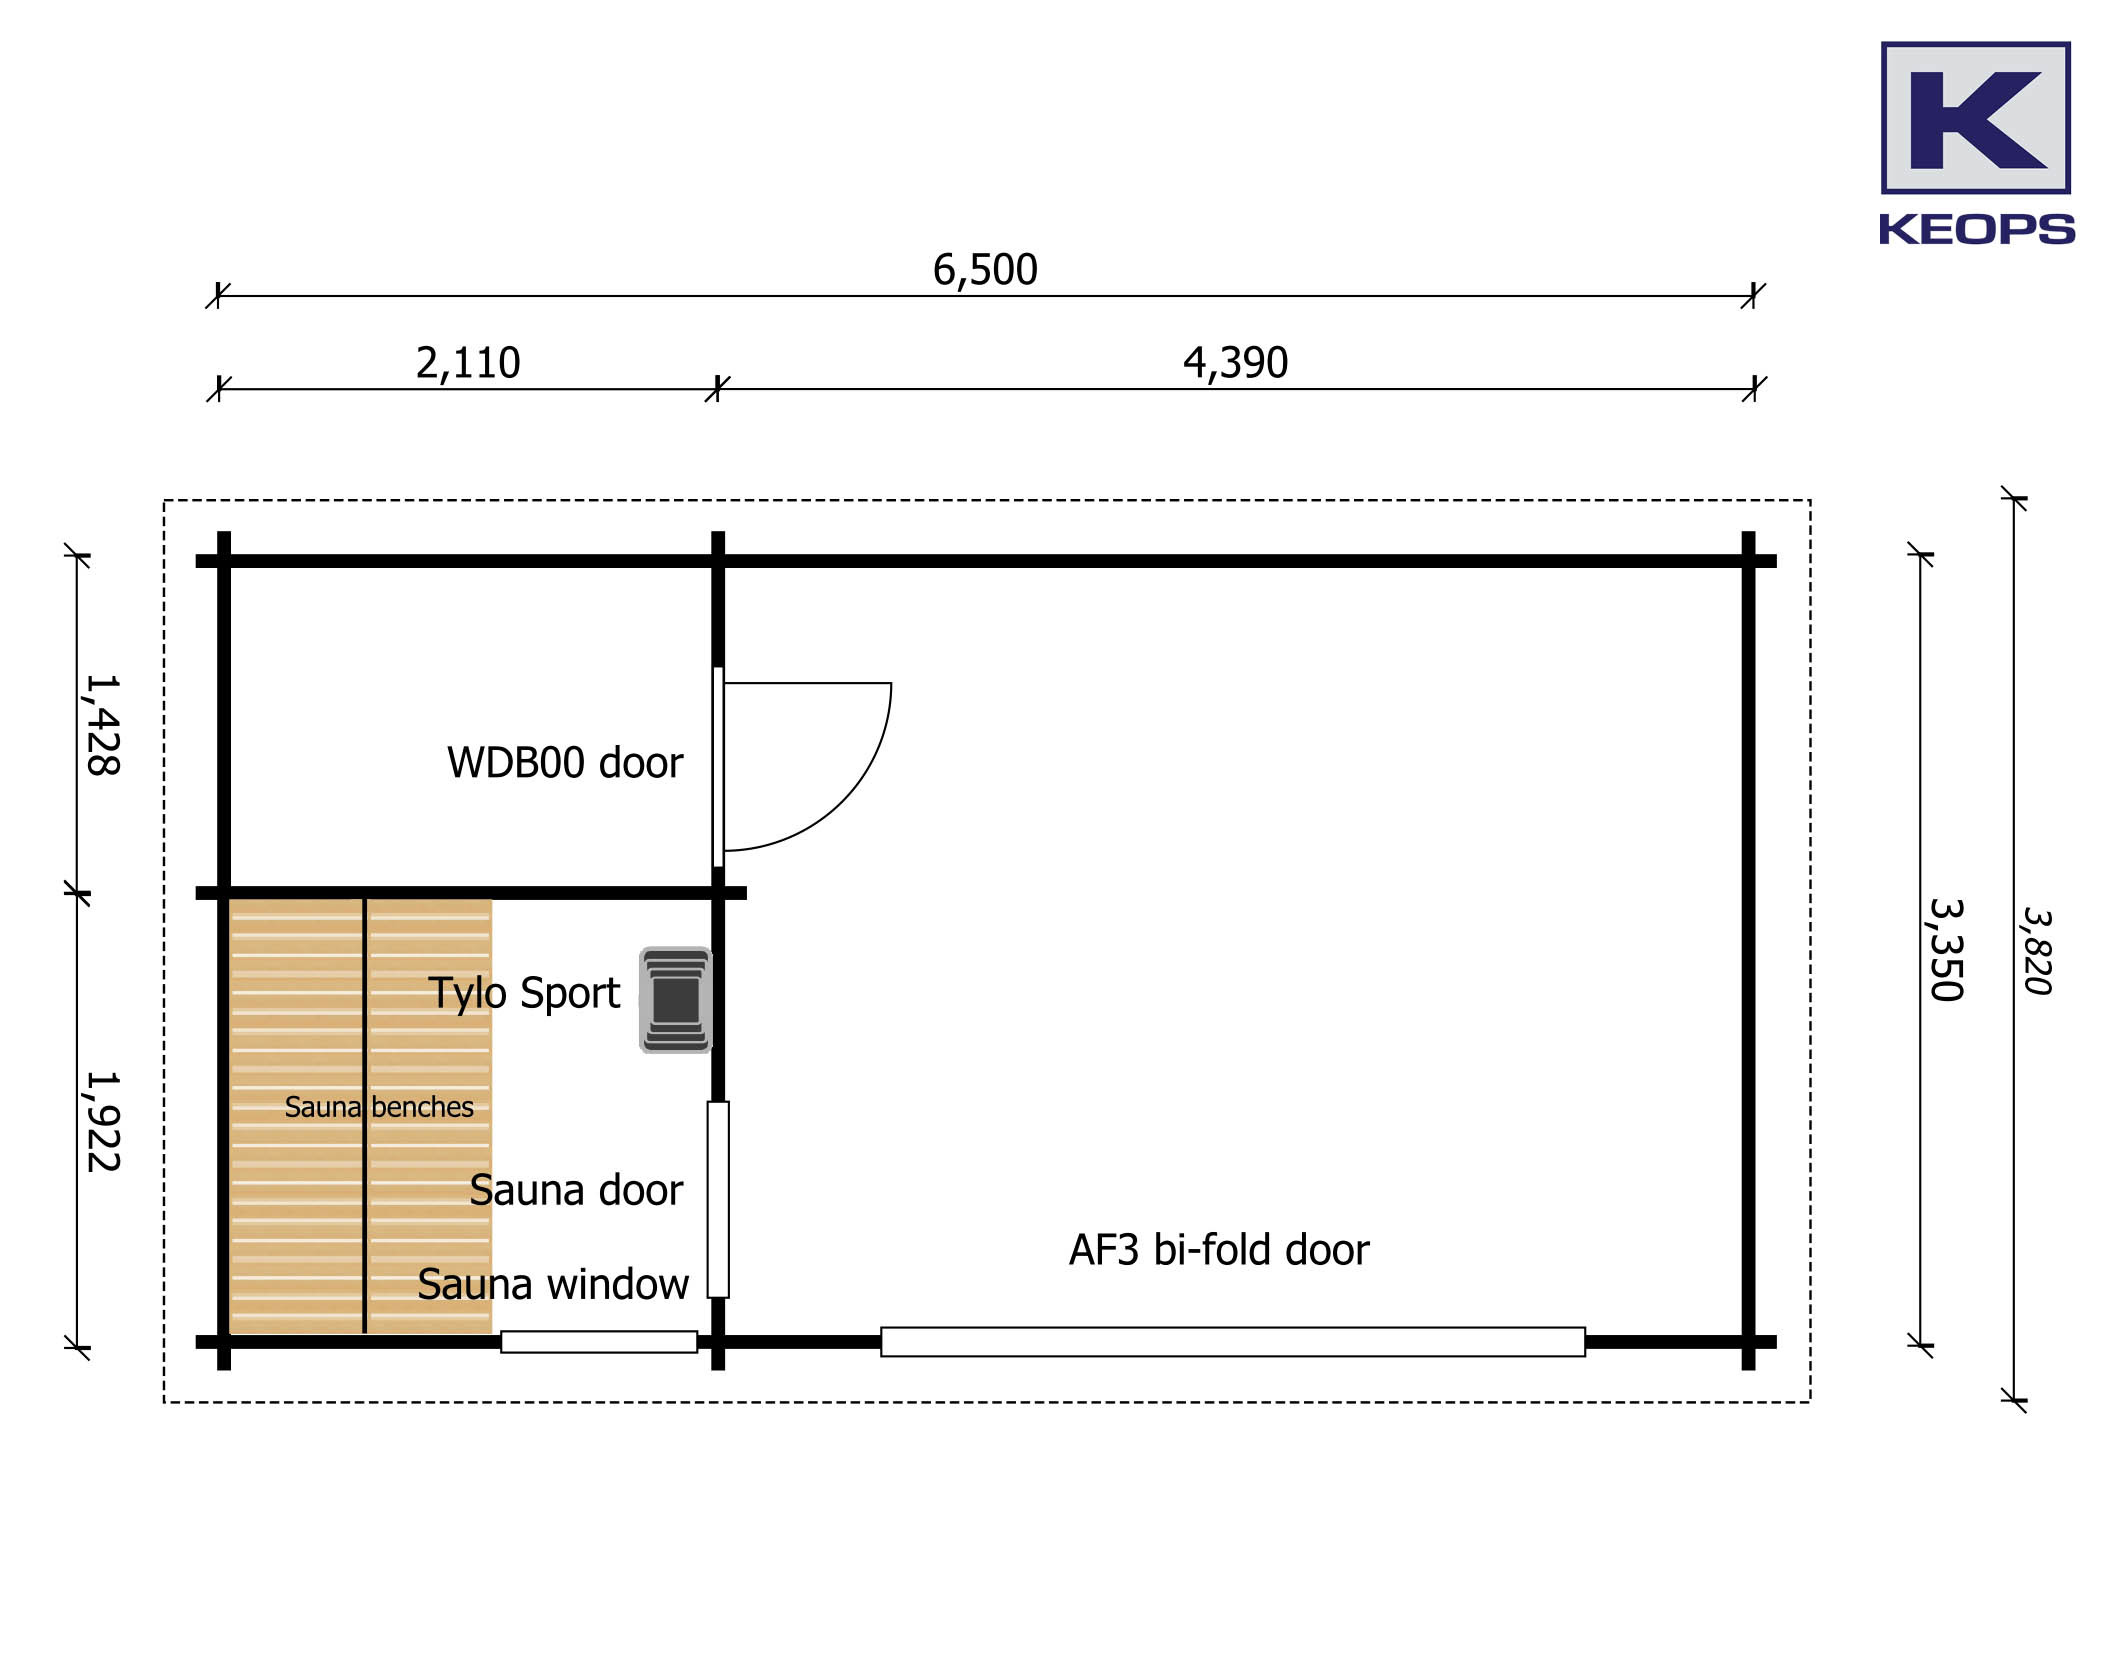 Floor plan - Moderna 6.5m x 3.35m with sauna